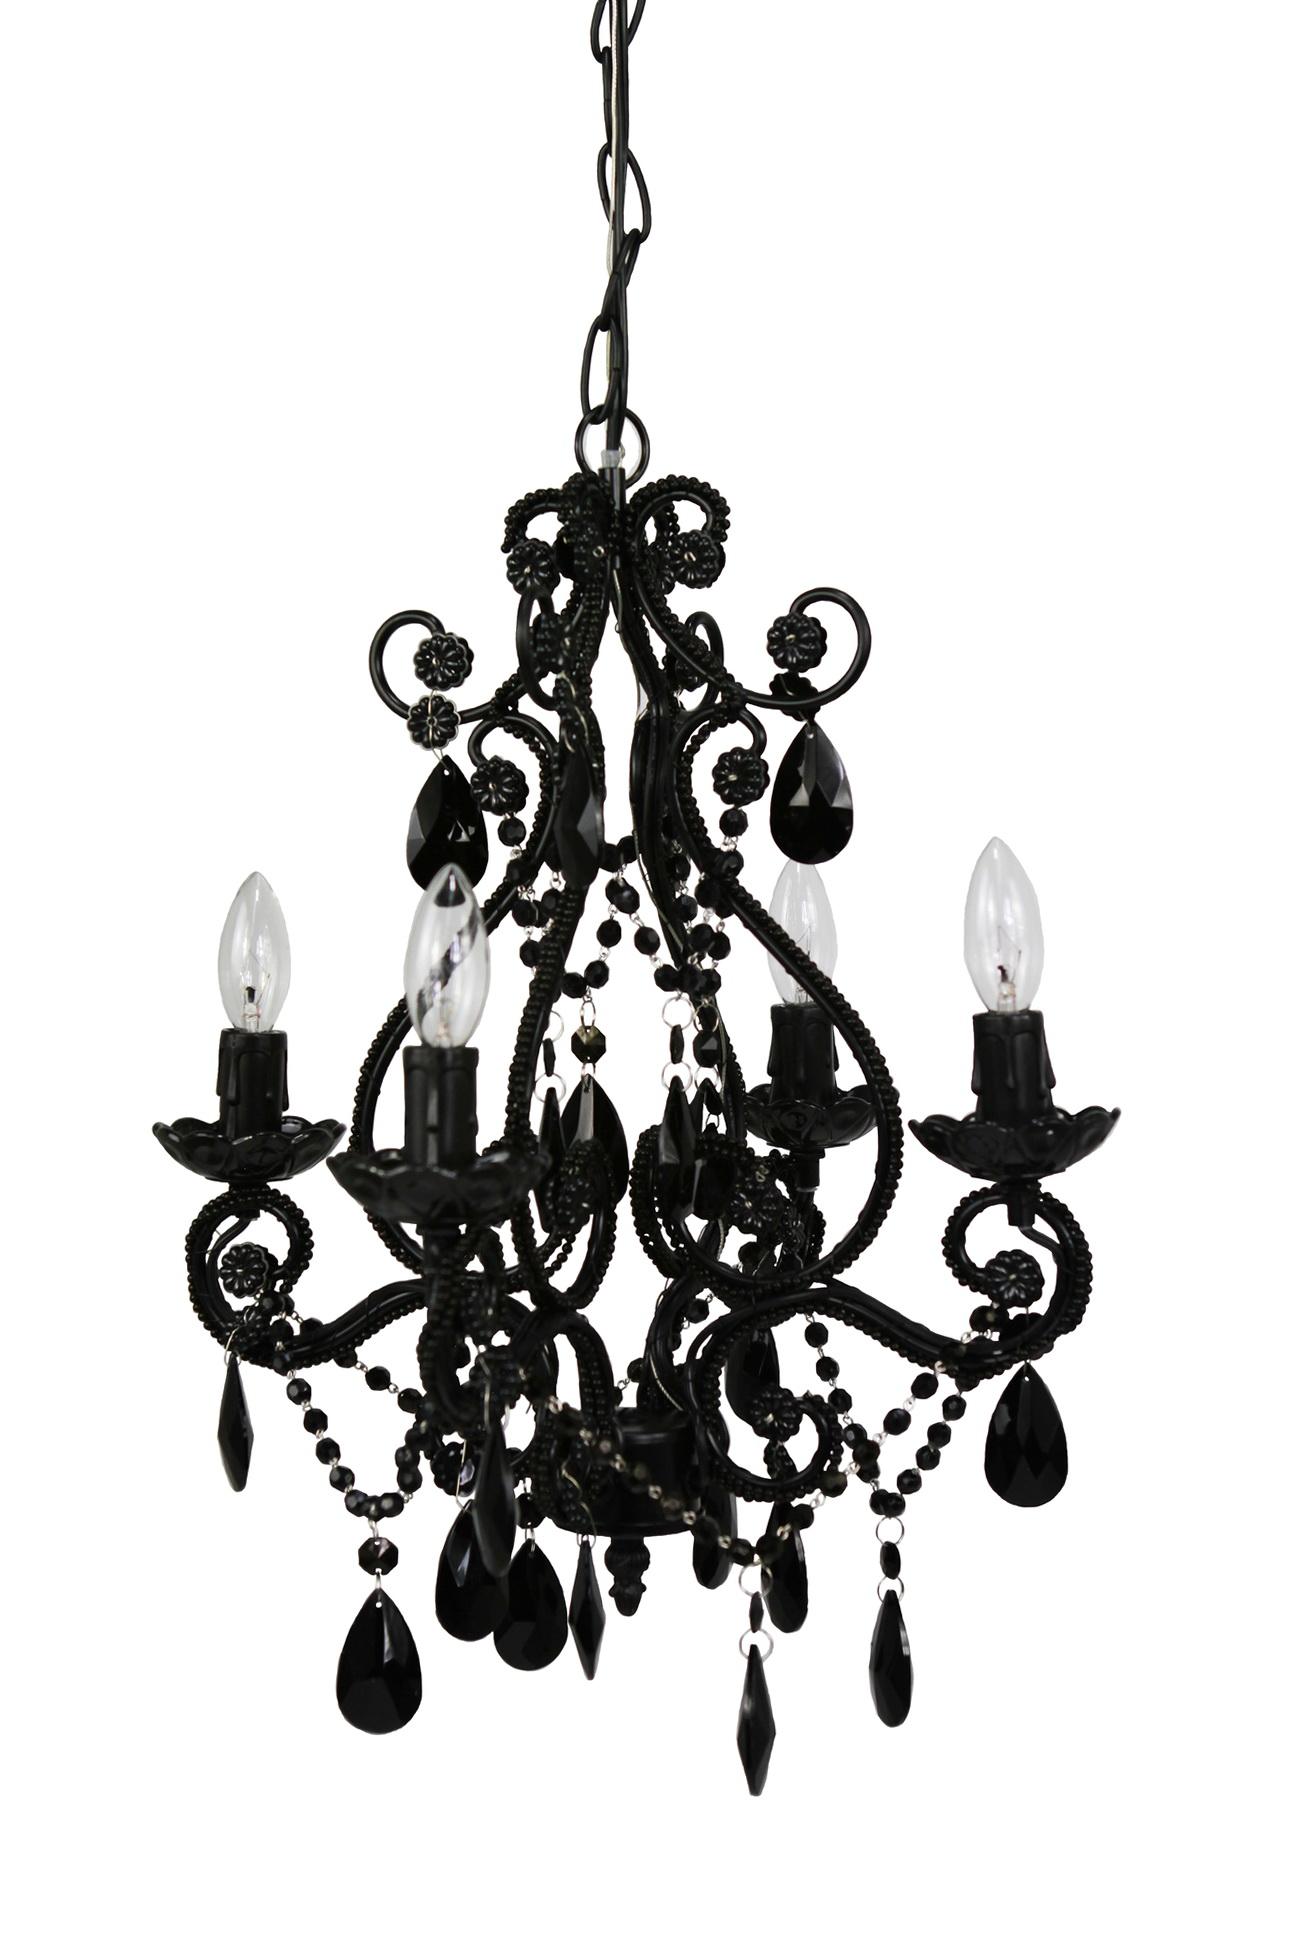 Achandelier Black Light Bulbs